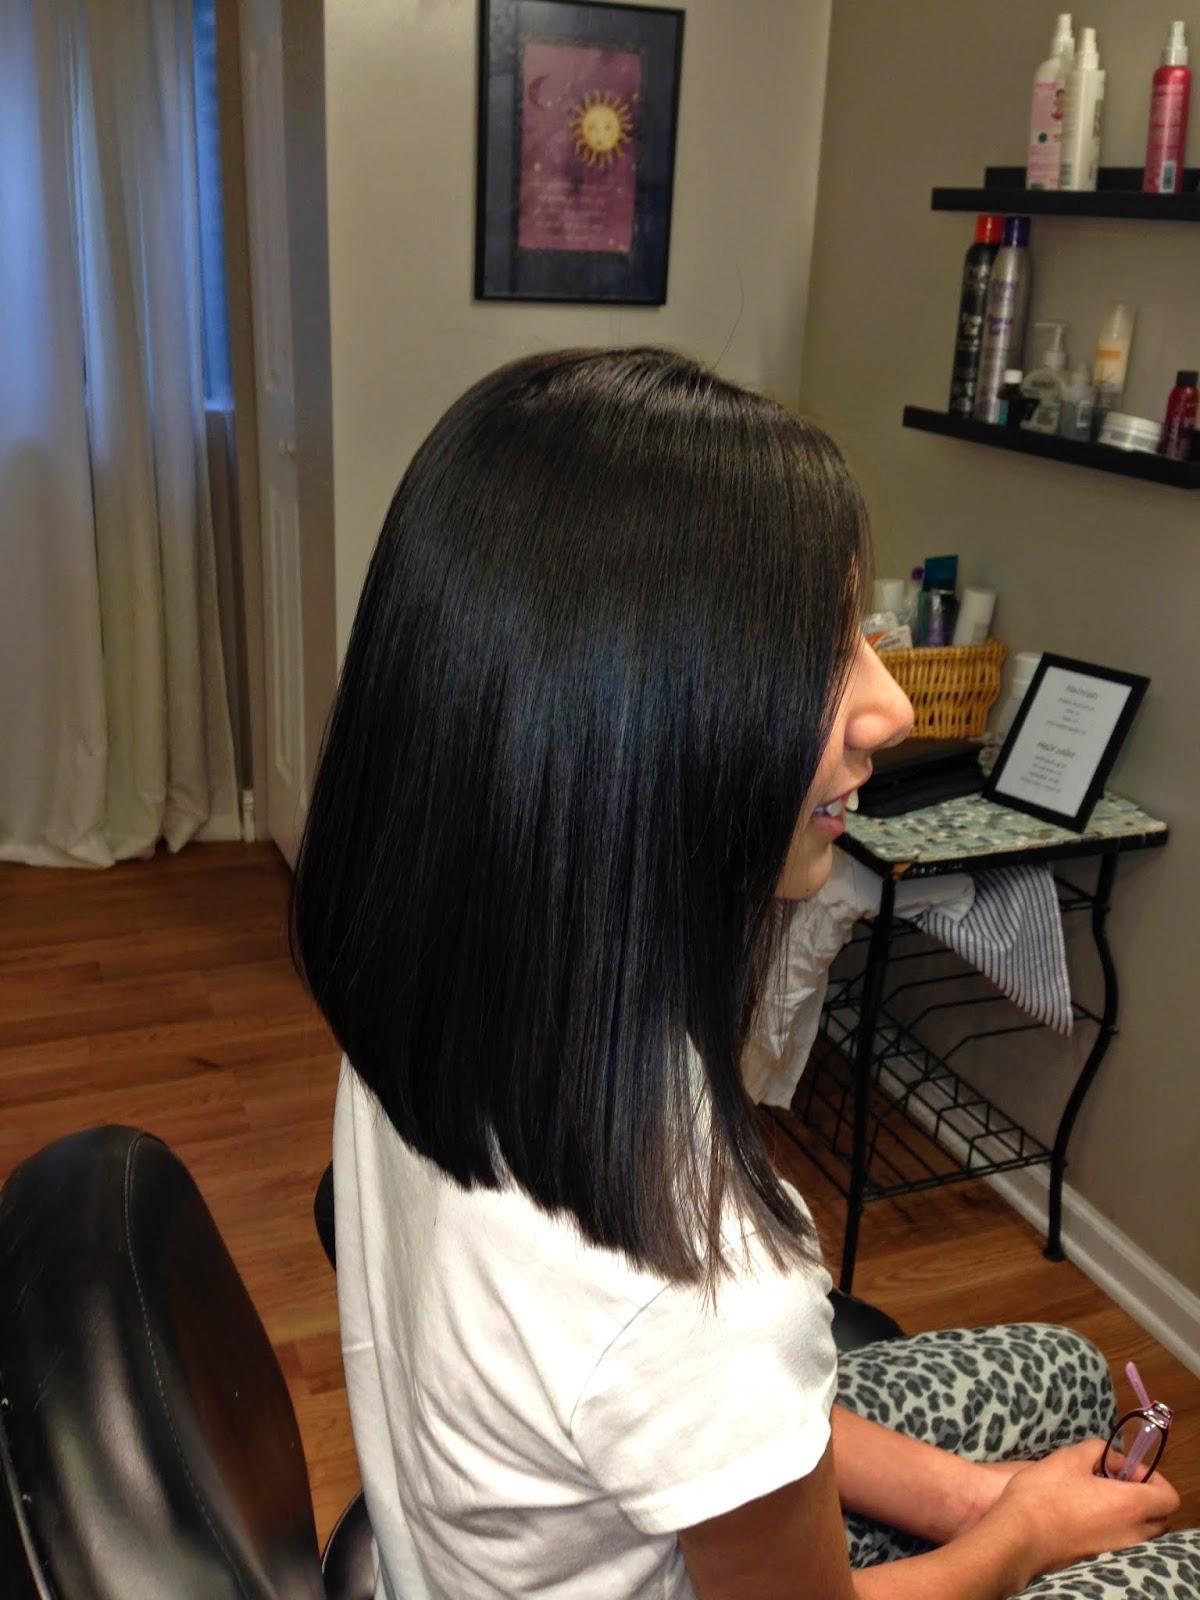 Hairstylist How-to: Layered Angled Bob Haircut (Hair ...